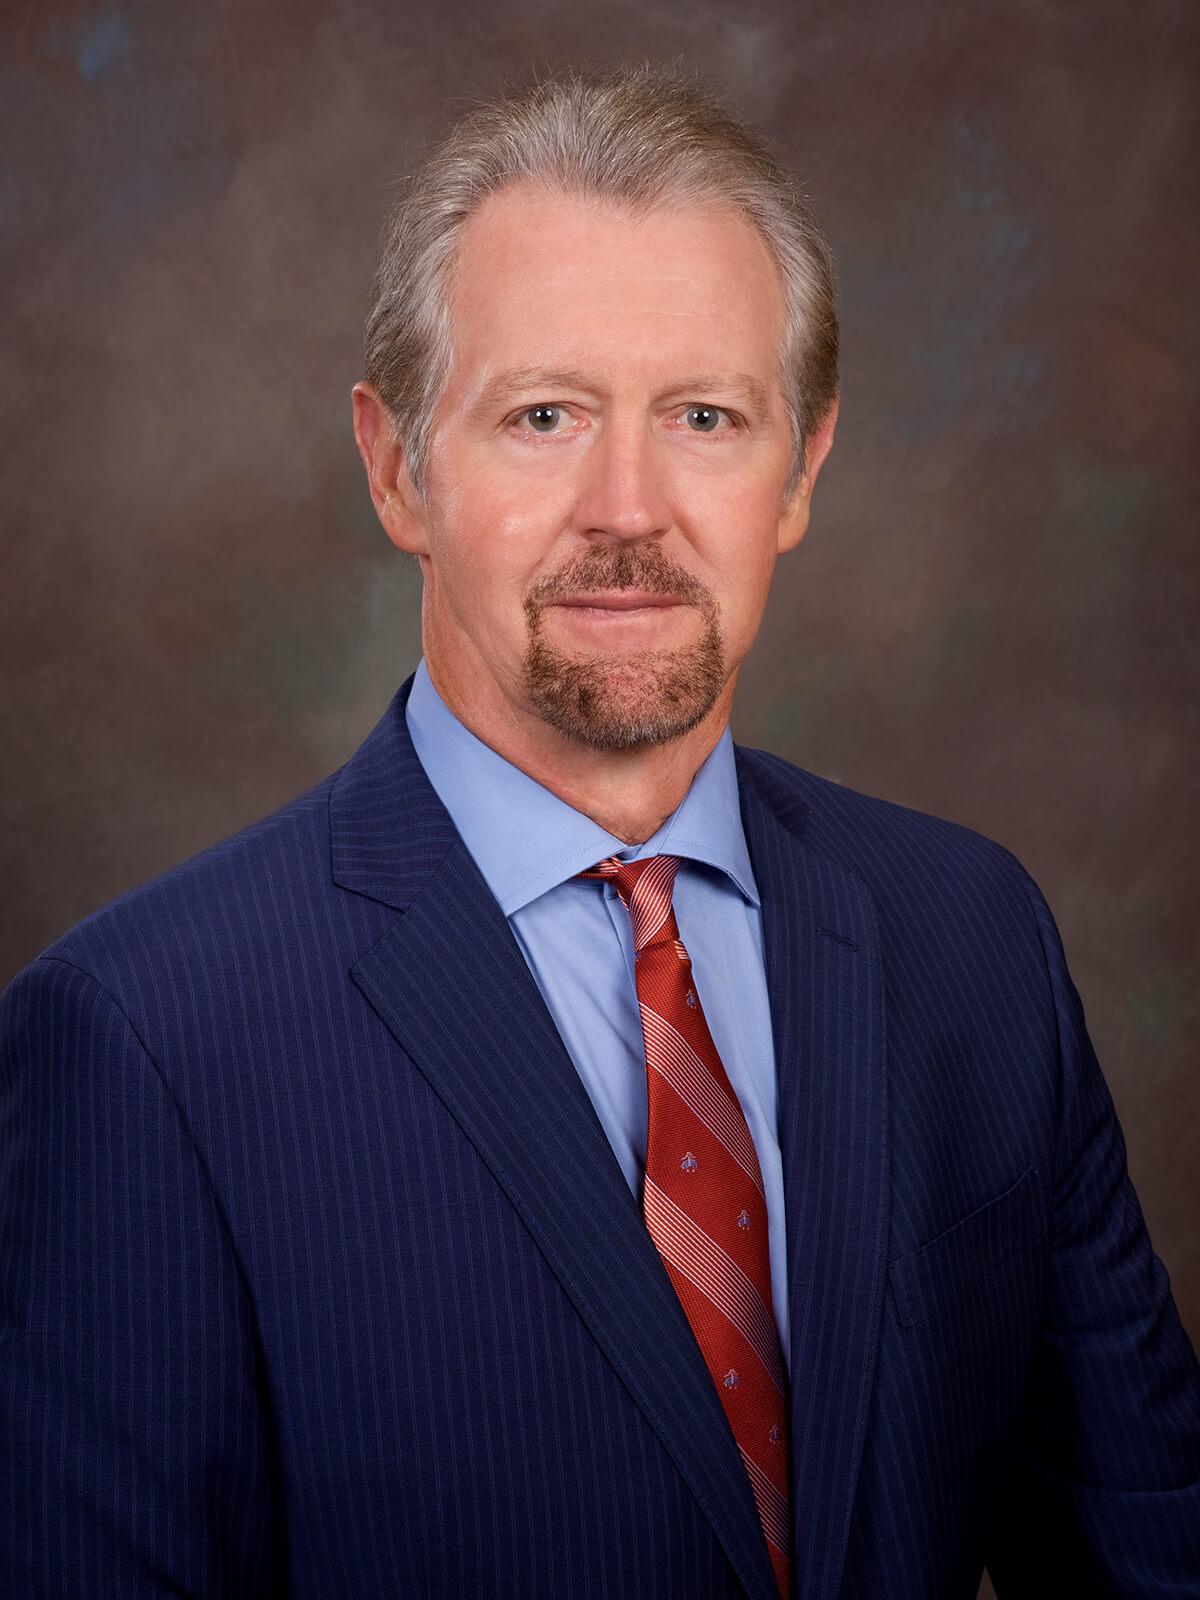 G. Joseph Harrison